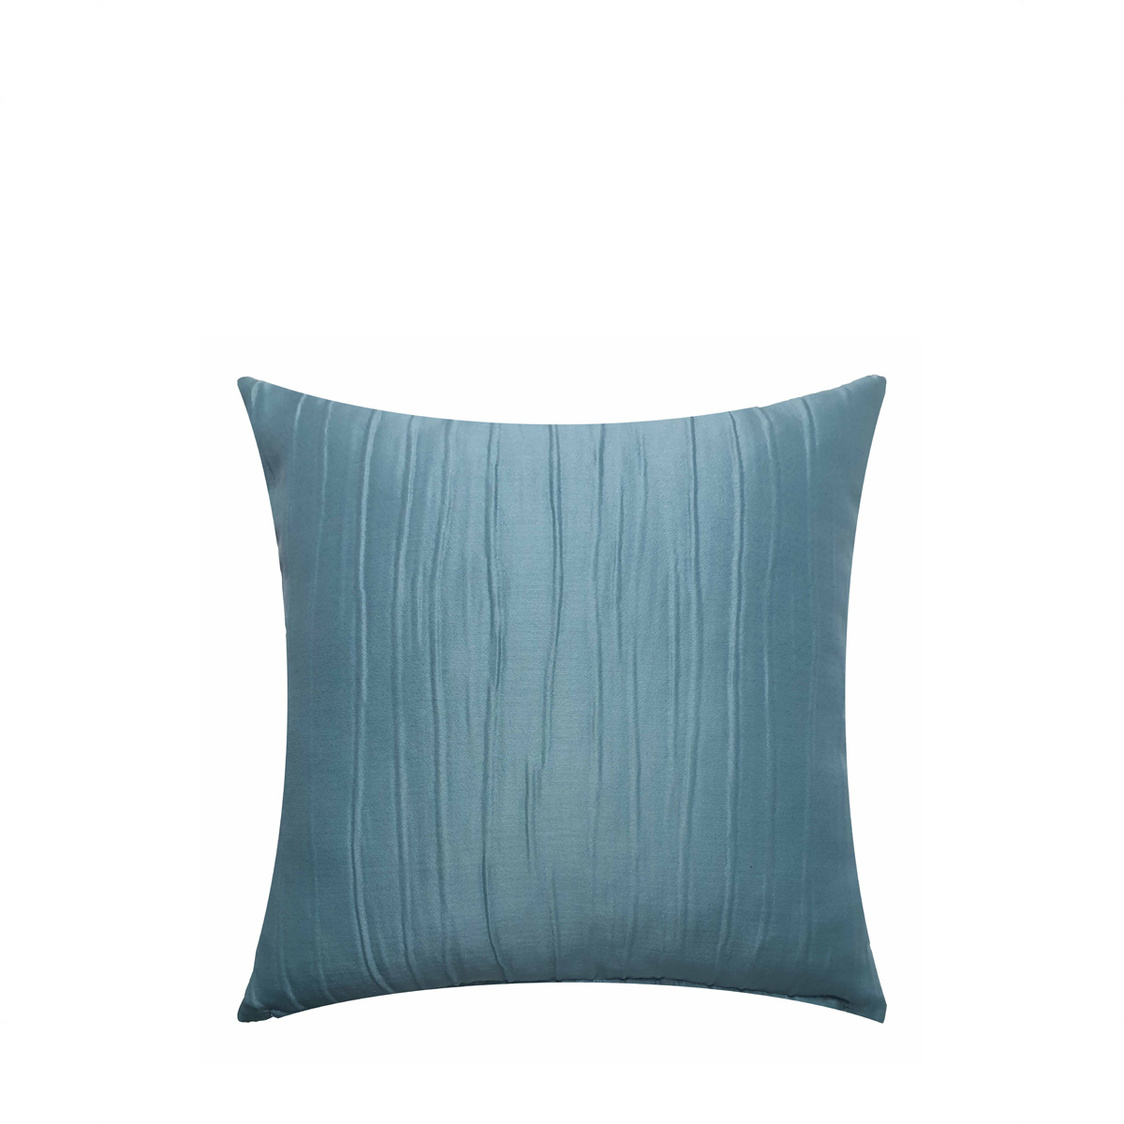 JRapee Pleats Cushion Cover Sky 43x43cm